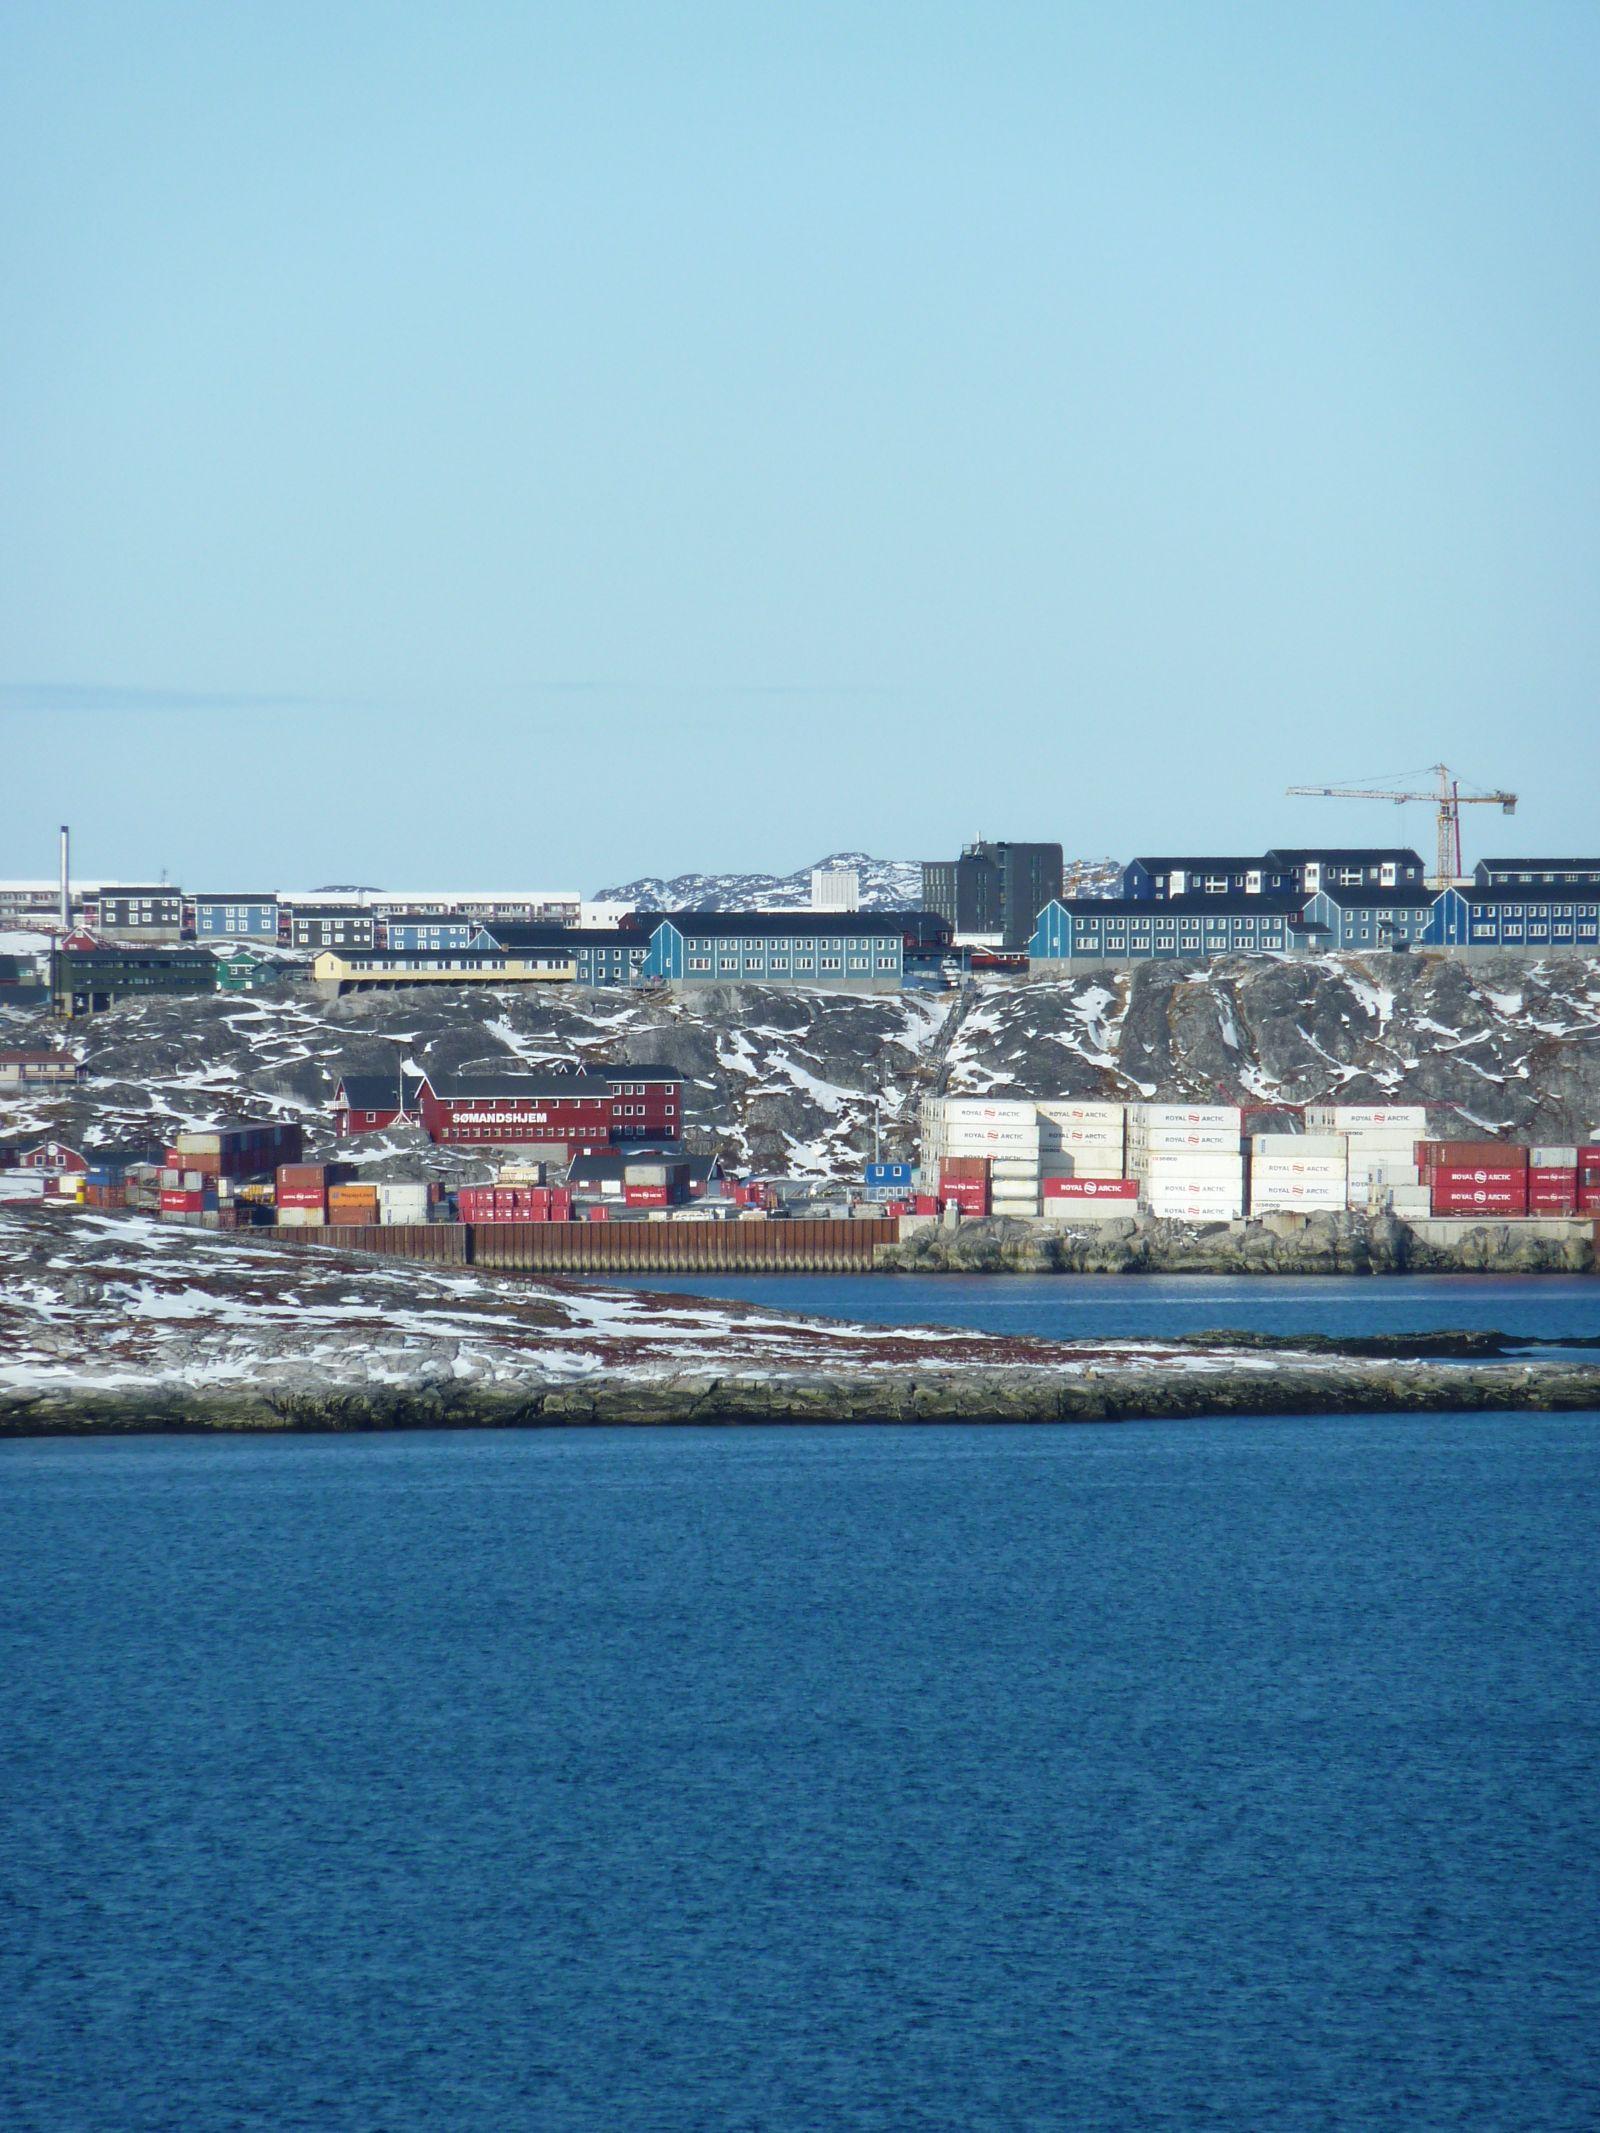 Nuuk havn set fra Qinnqorput